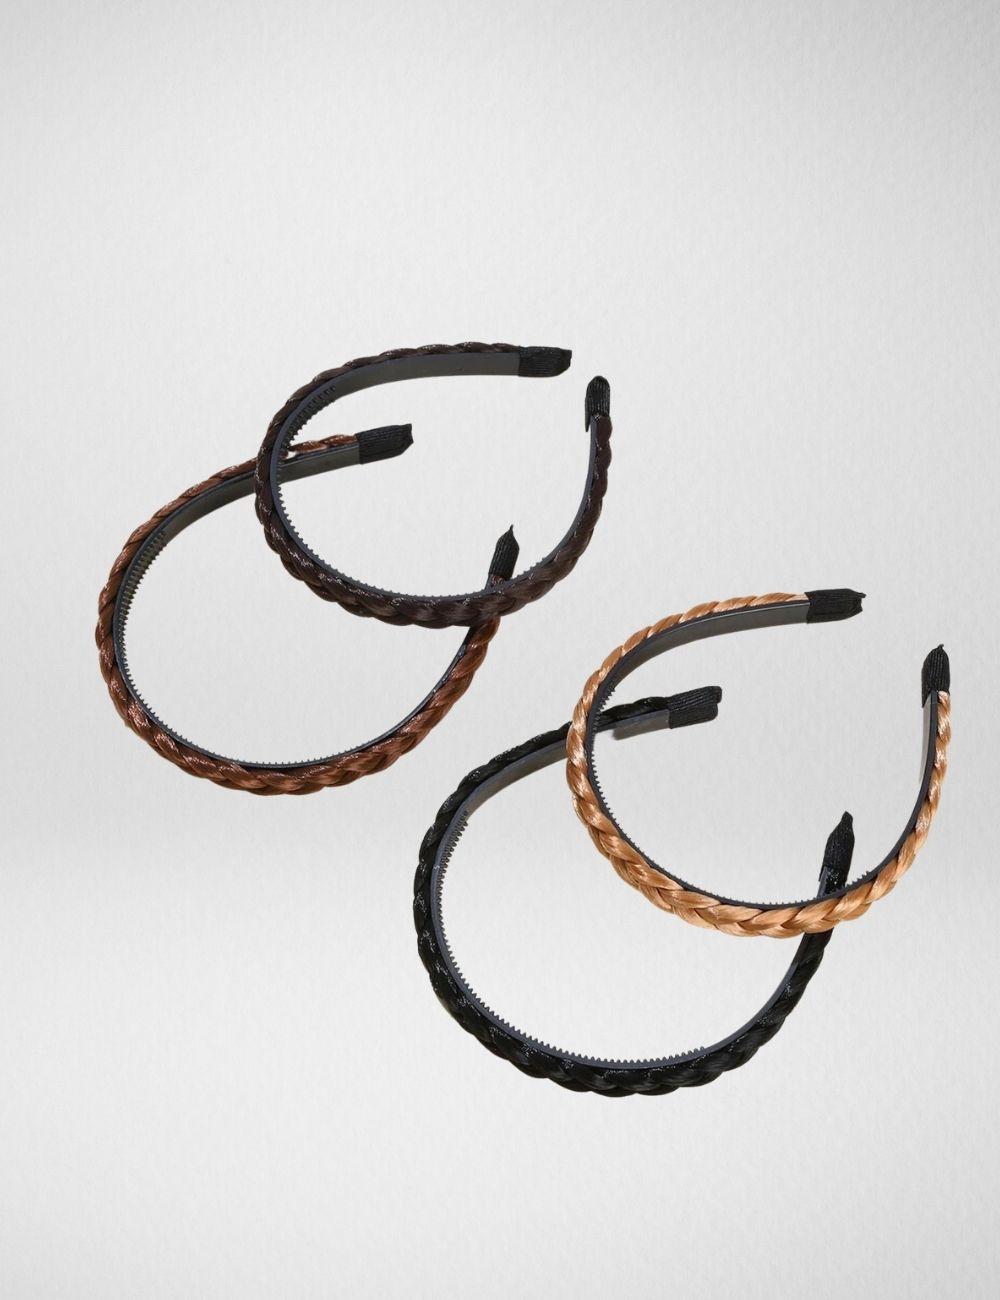 Braided hair hoops